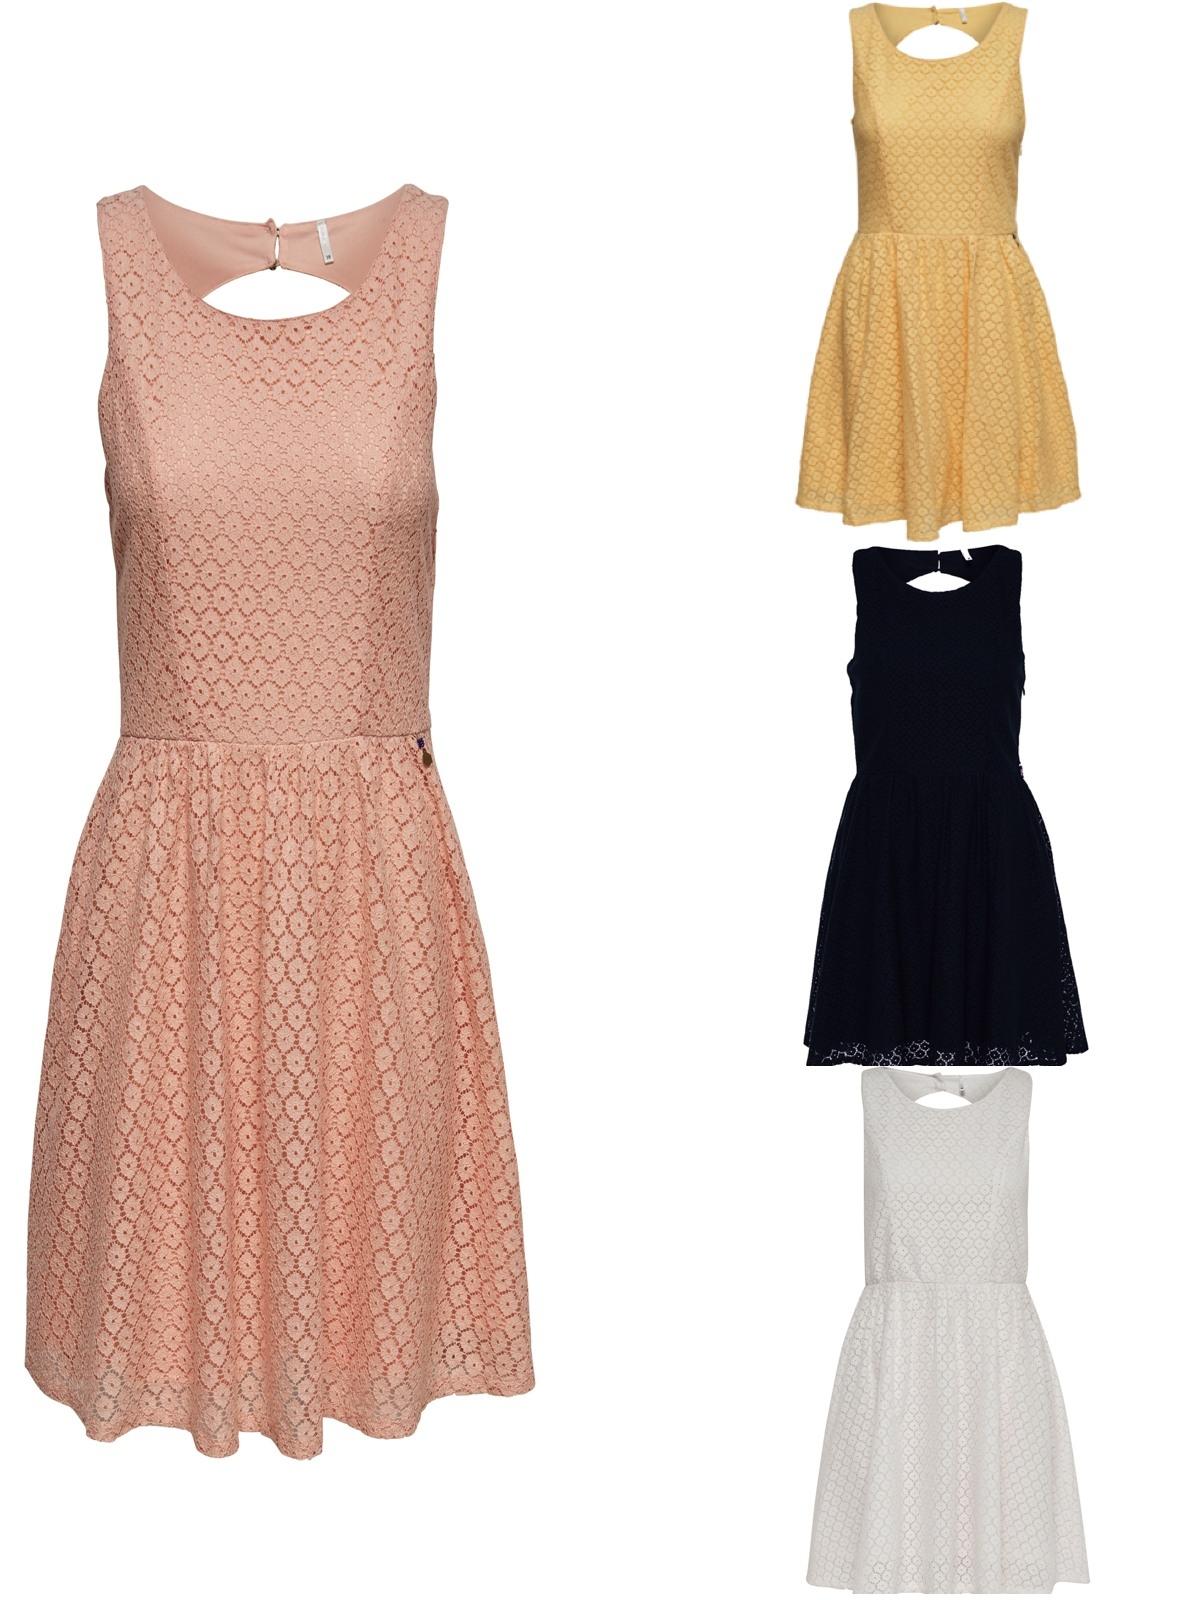 15 Kreativ Sommerkleid Spitze Design13 Top Sommerkleid Spitze Vertrieb